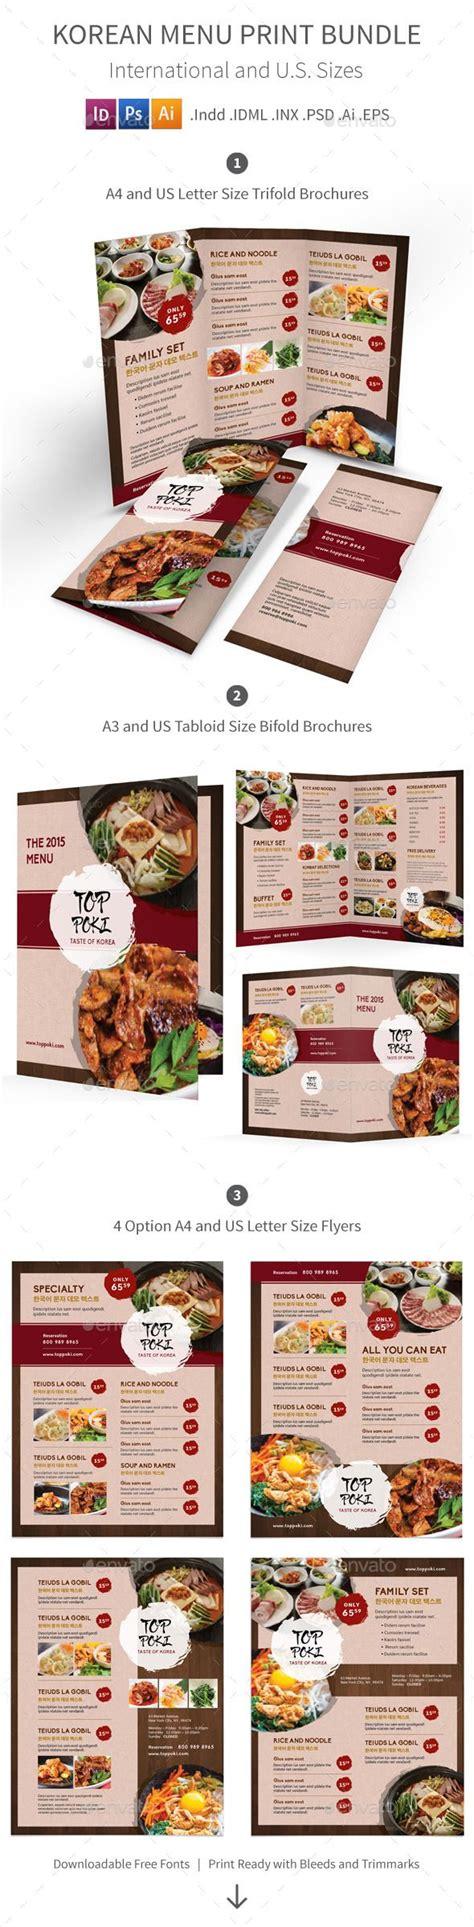 menu design korean 14 best korean restaurant interiors images on pinterest